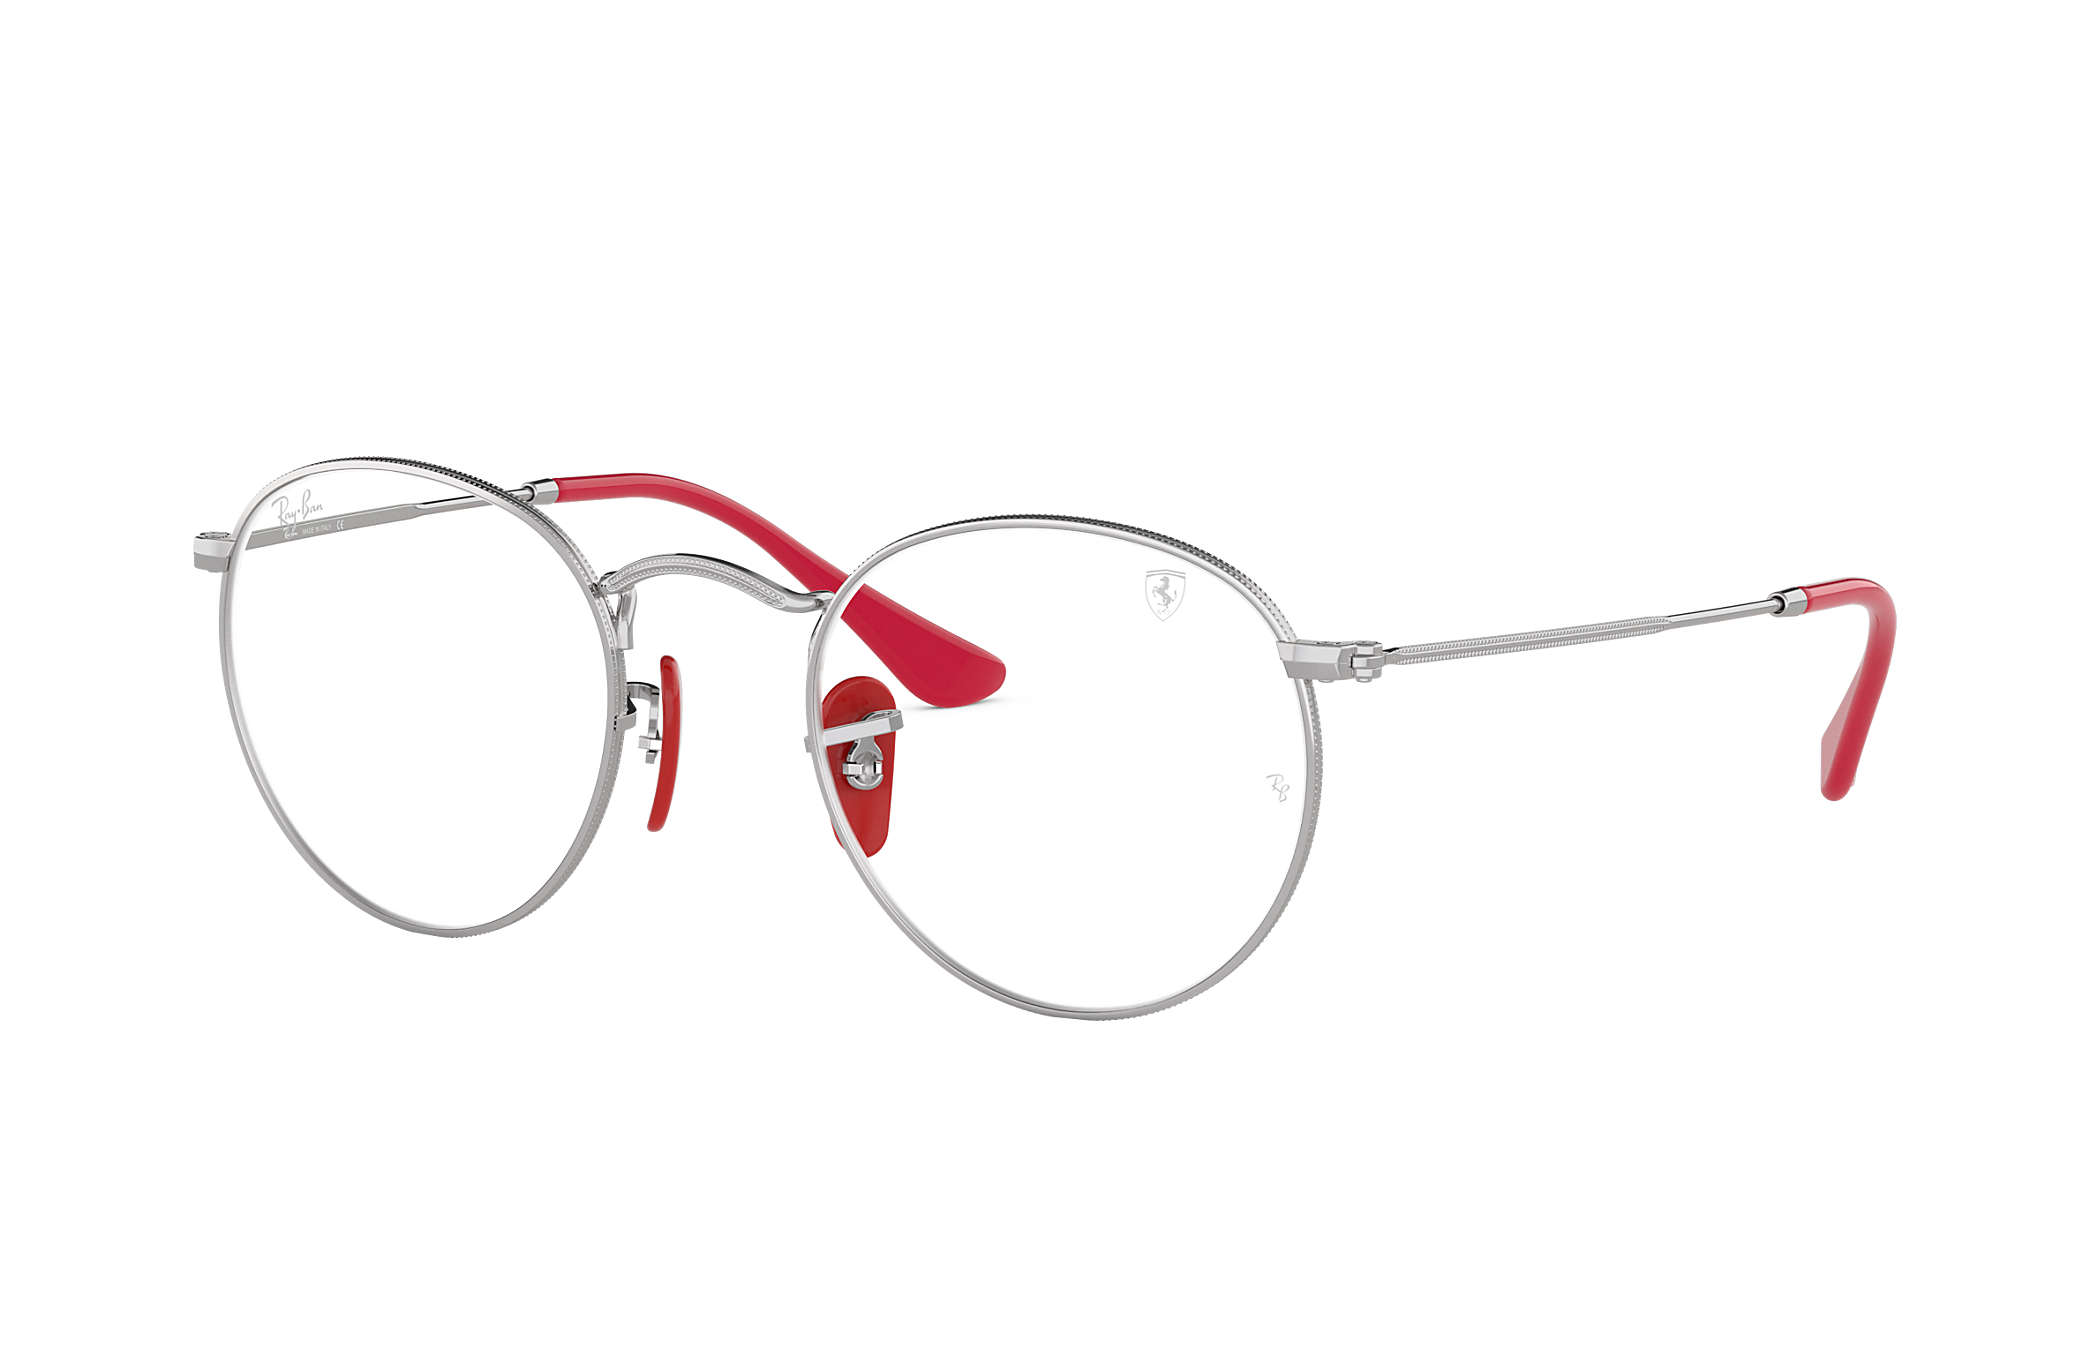 Ray Ban Eyeglasses Rb3447vm Silver Metal 0rx3447vmf03150 Ray Ban Denmark